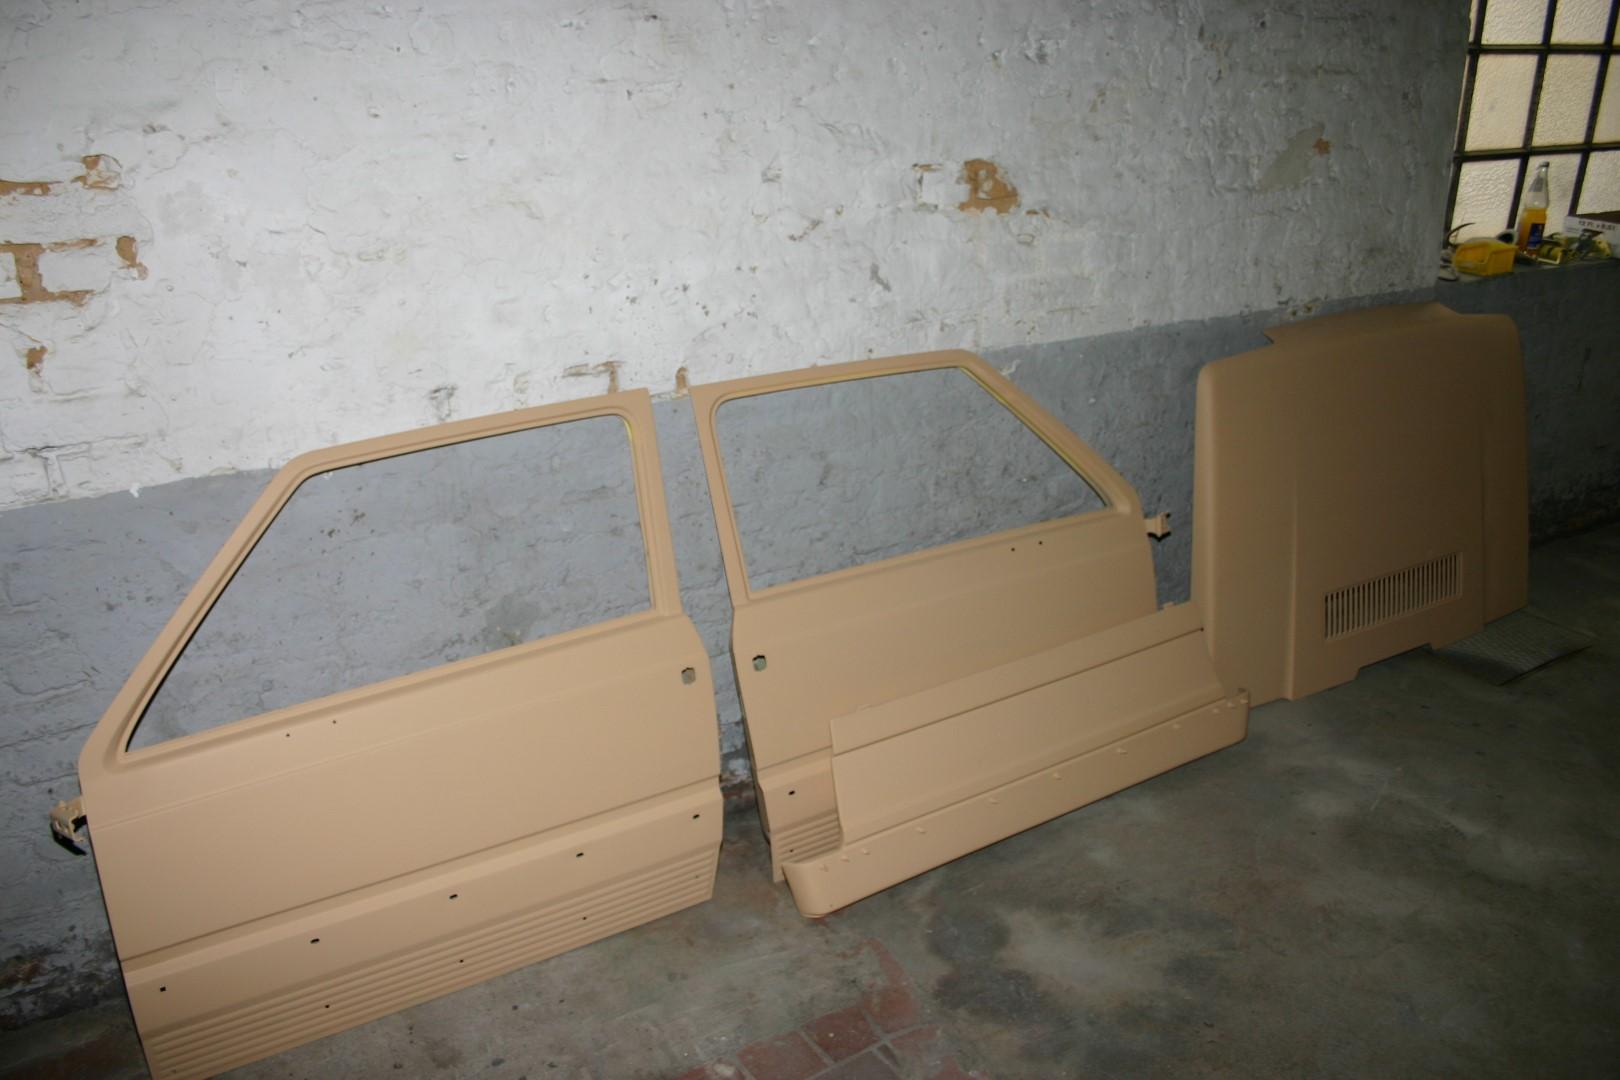 2005-04-16 (15)